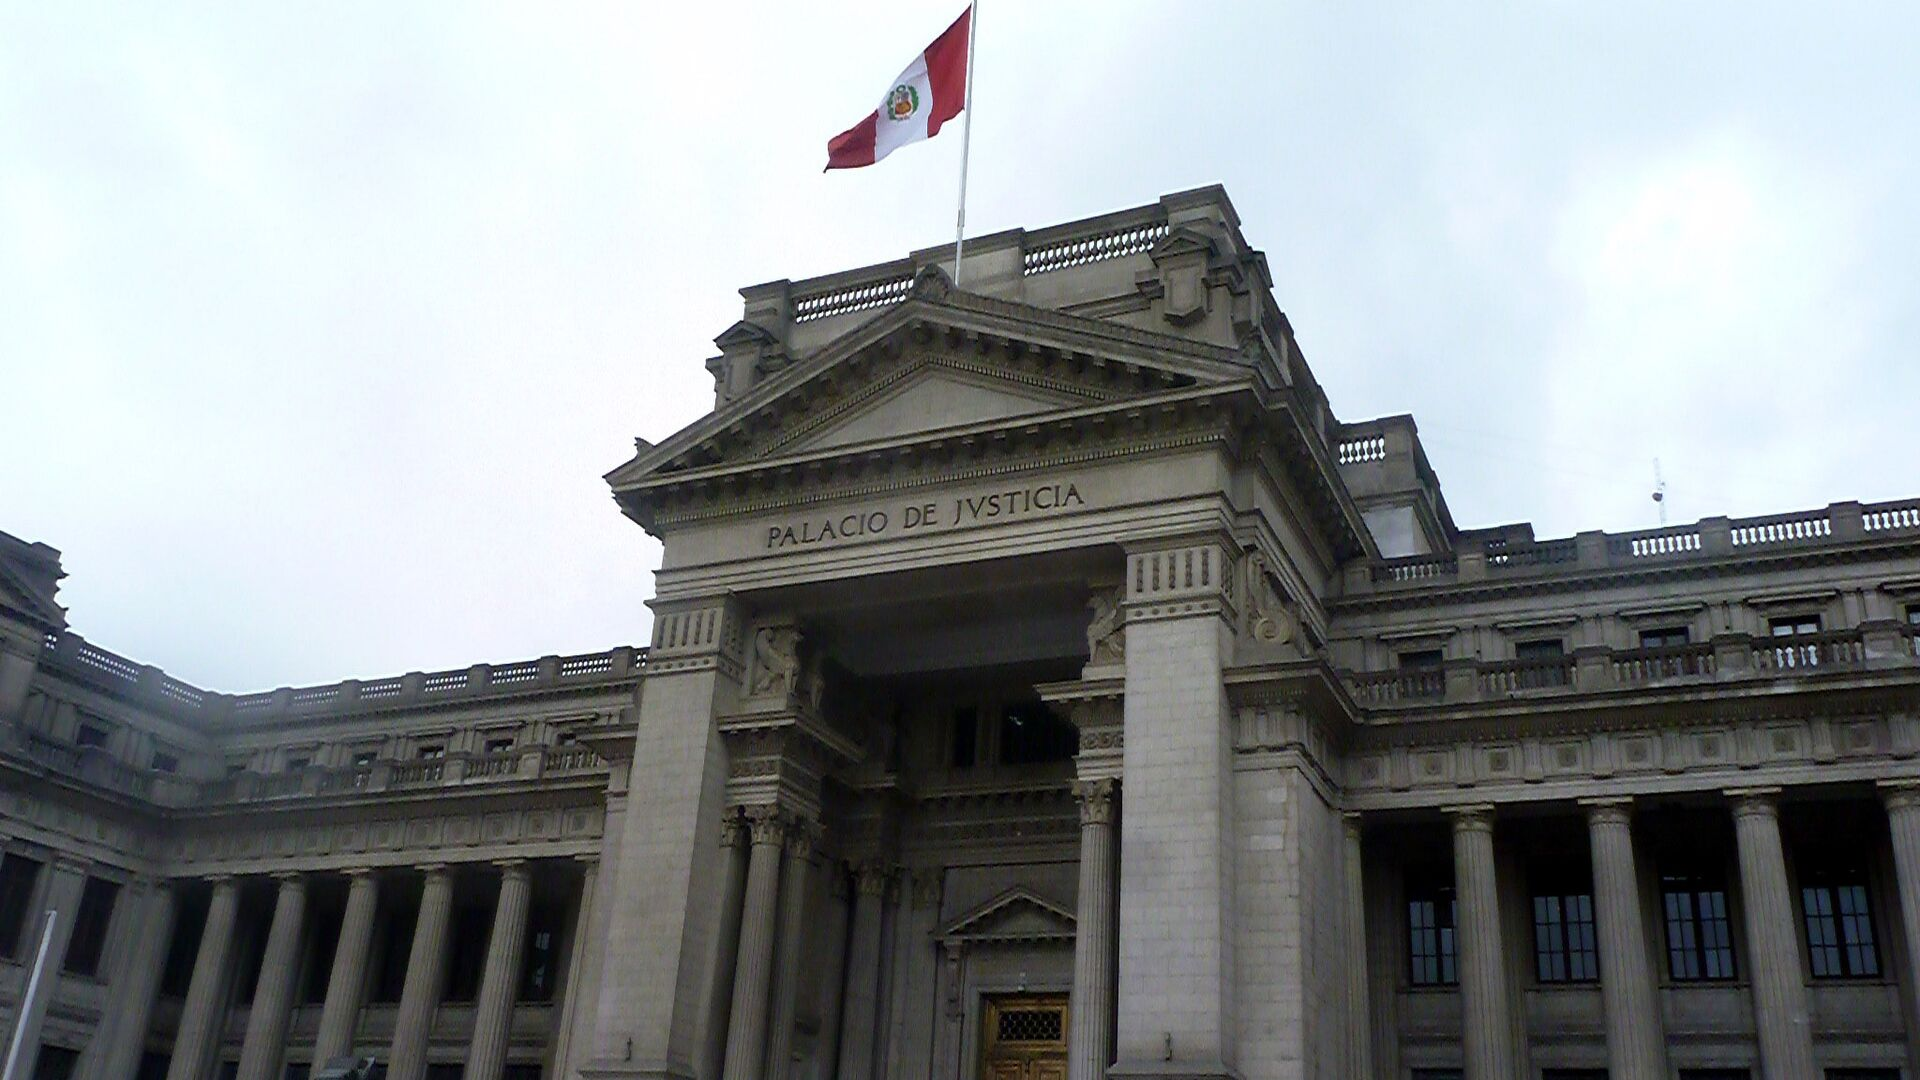 Palacio de Justicia de Perú - Sputnik Mundo, 1920, 03.03.2021